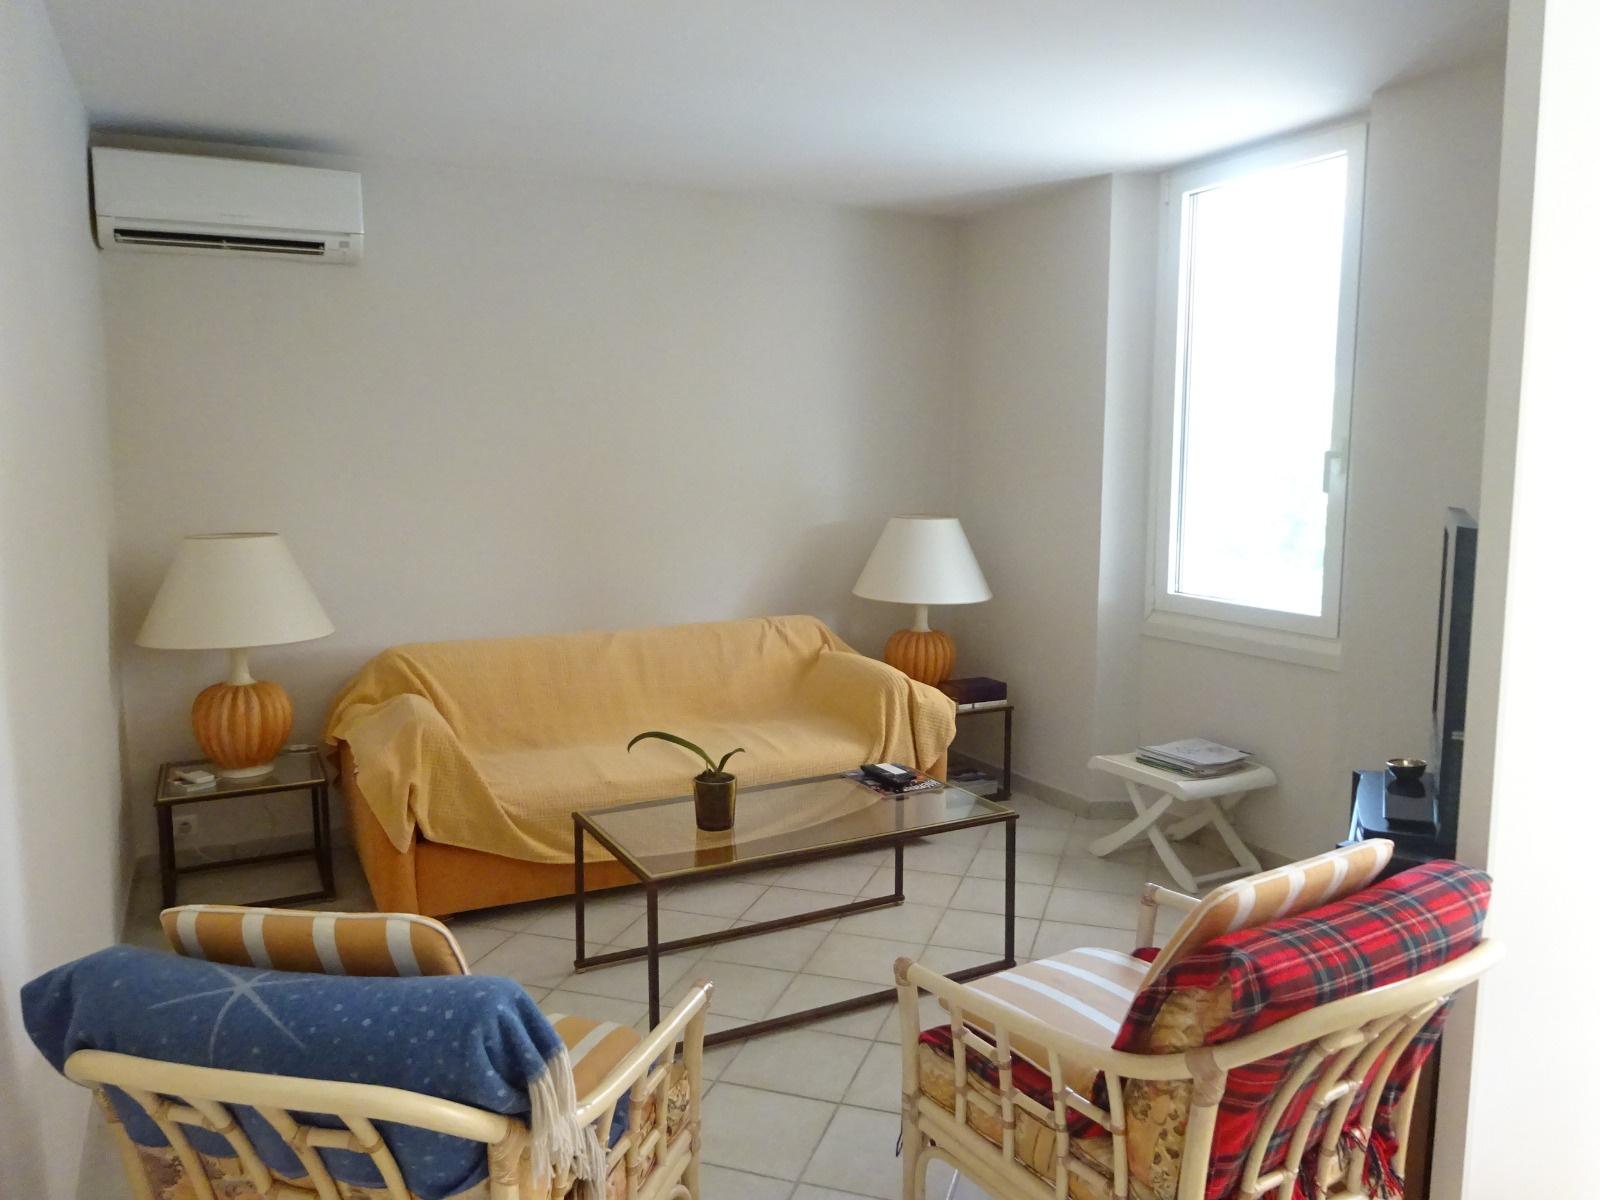 Image_9, Maison / villa, Saint-Cyr-sur-Mer, ref :30870